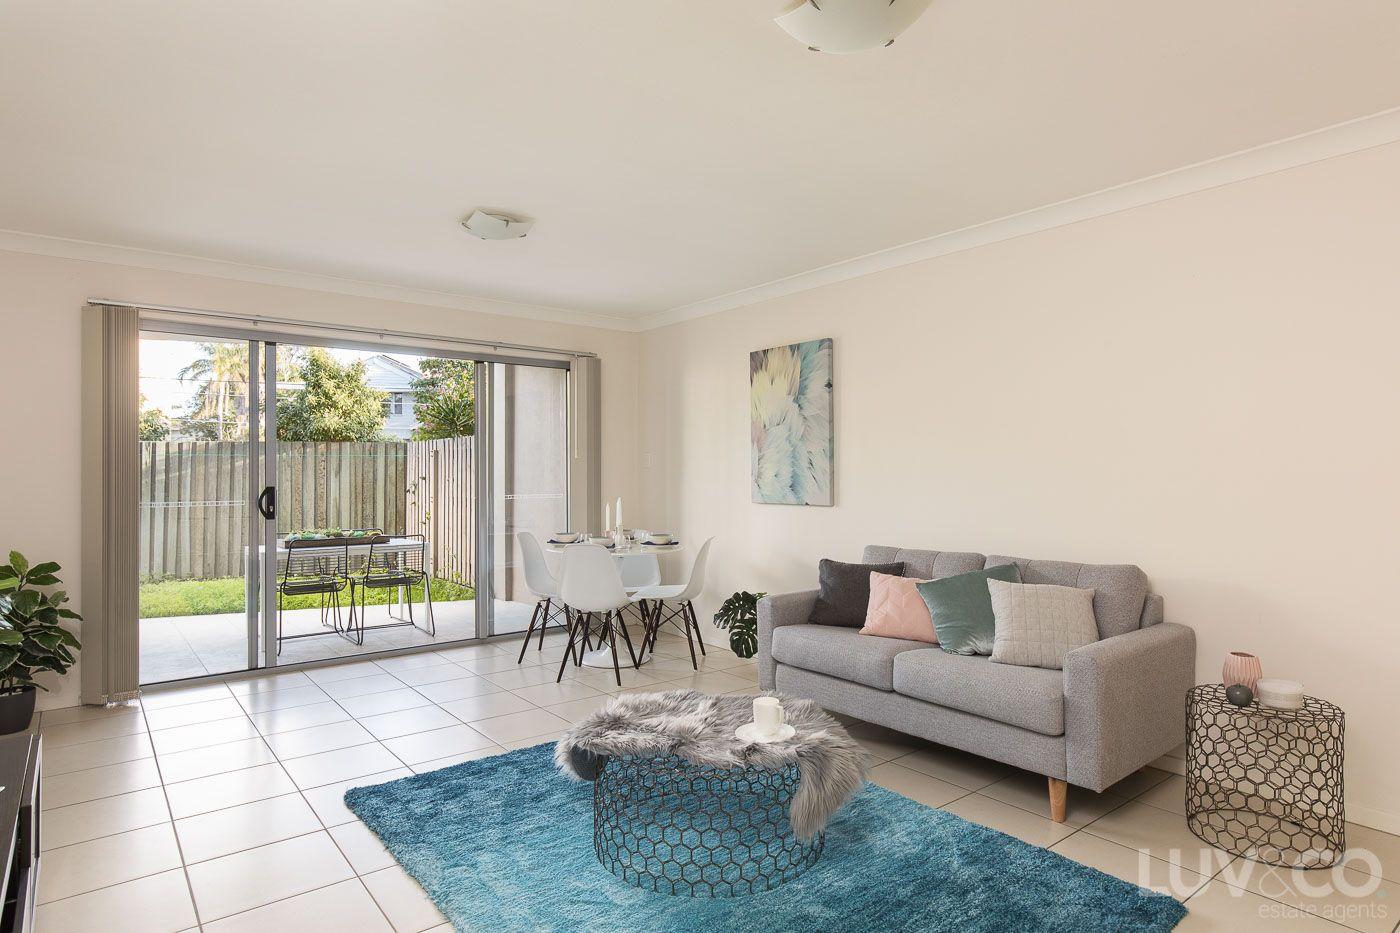 2/15 Crana Street, Gaythorne QLD 4051, Image 0